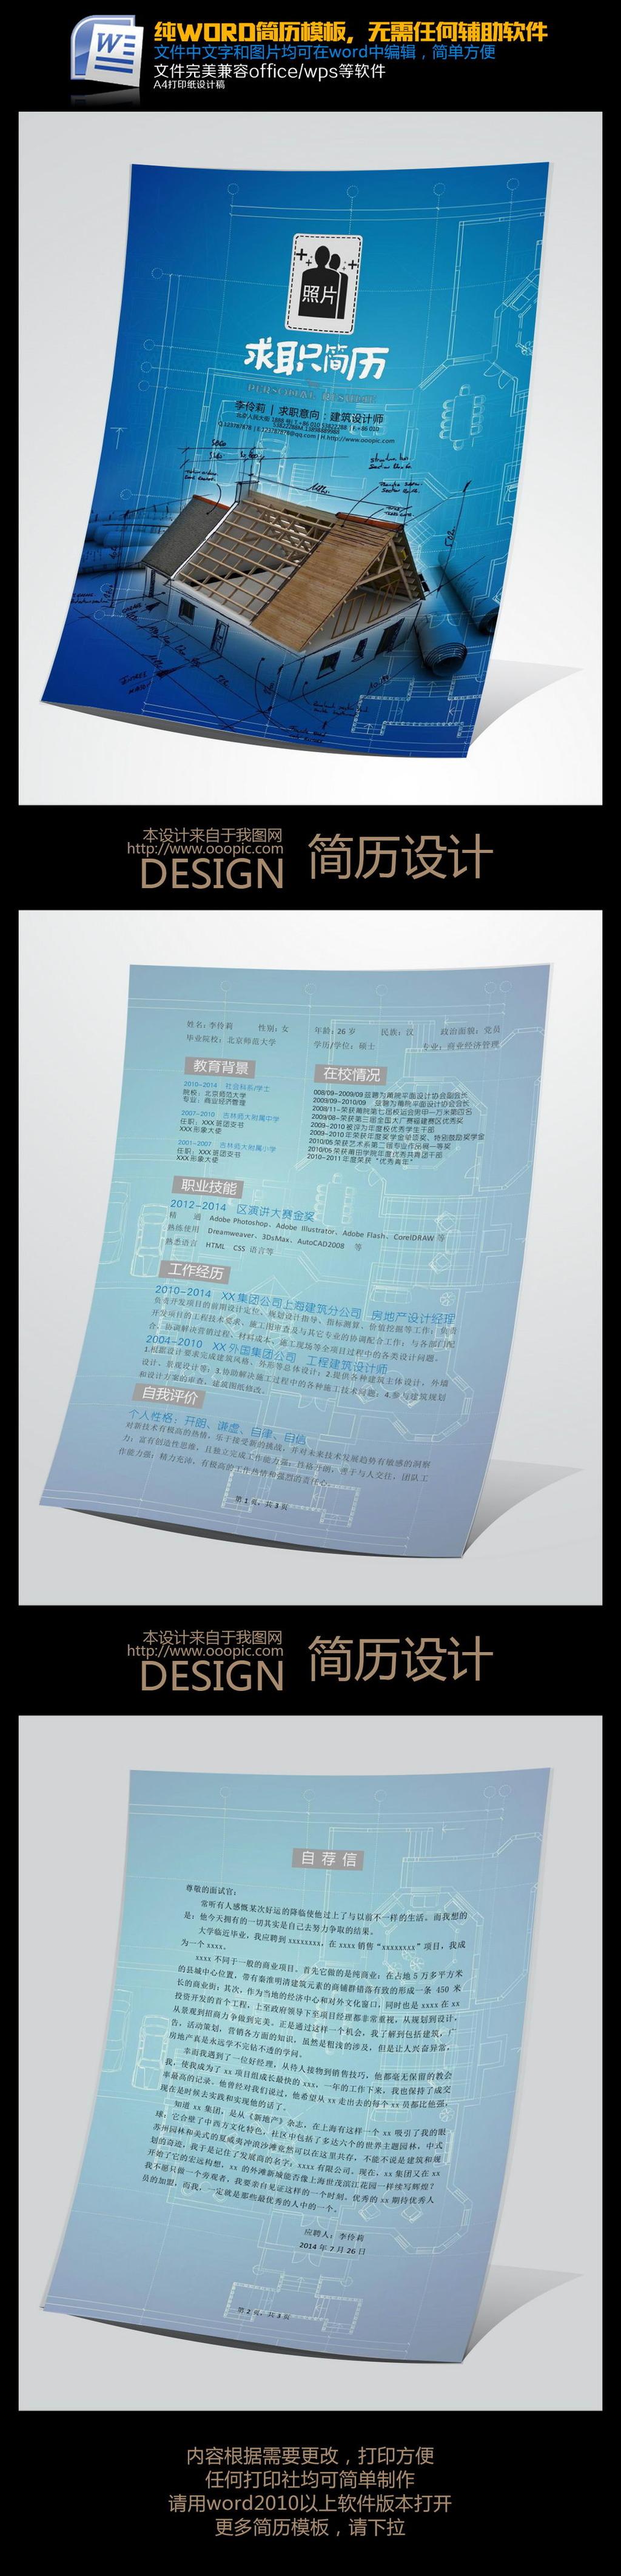 3pword建筑工程师地产设计师简历模板下载